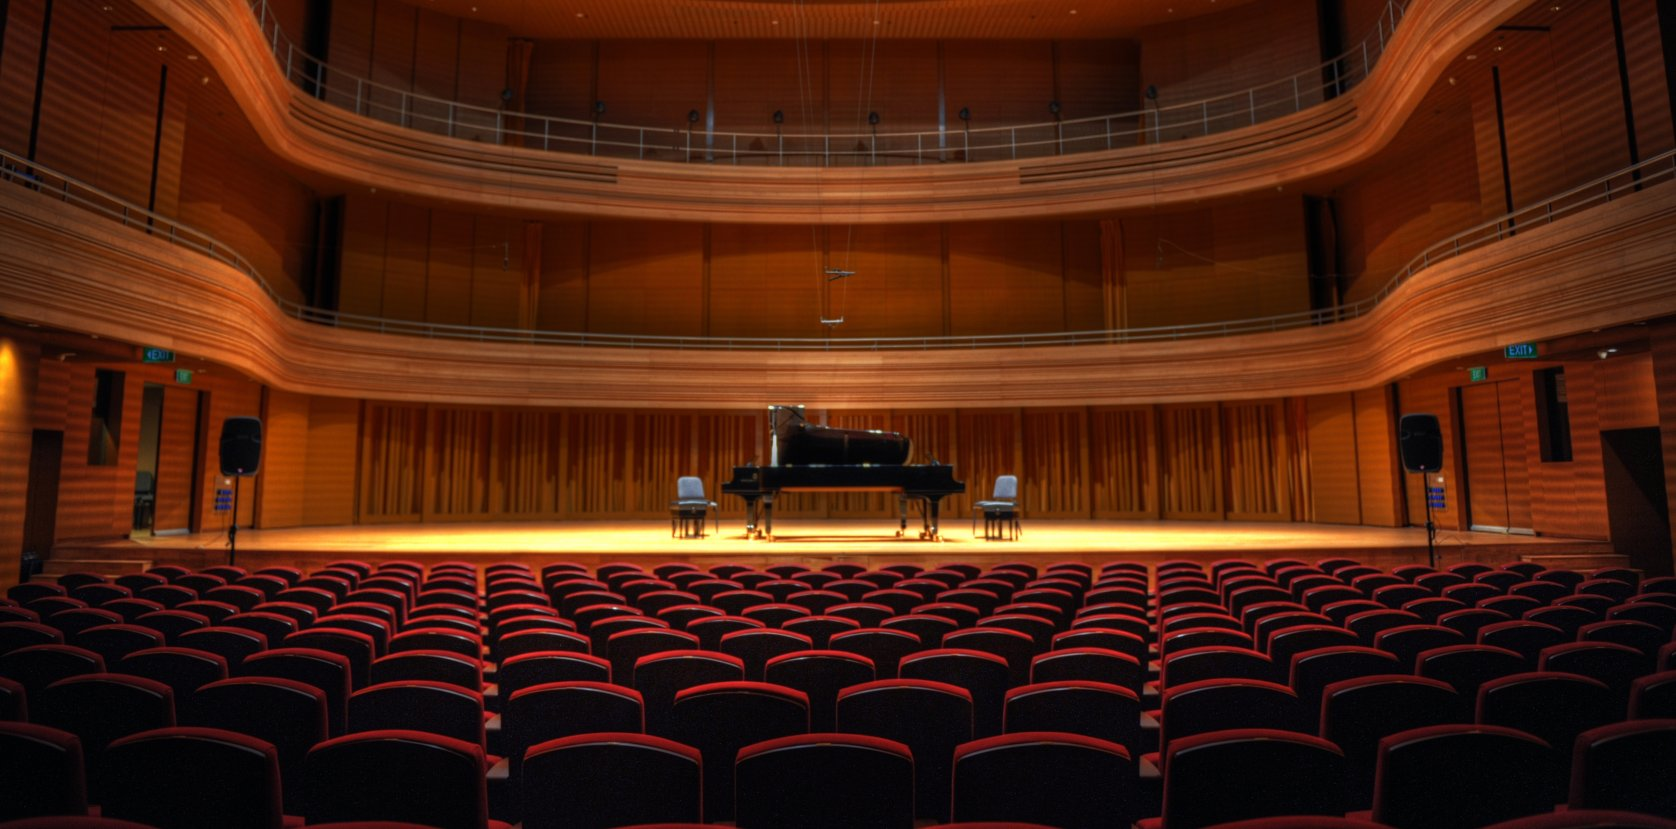 Konzertsaal1680